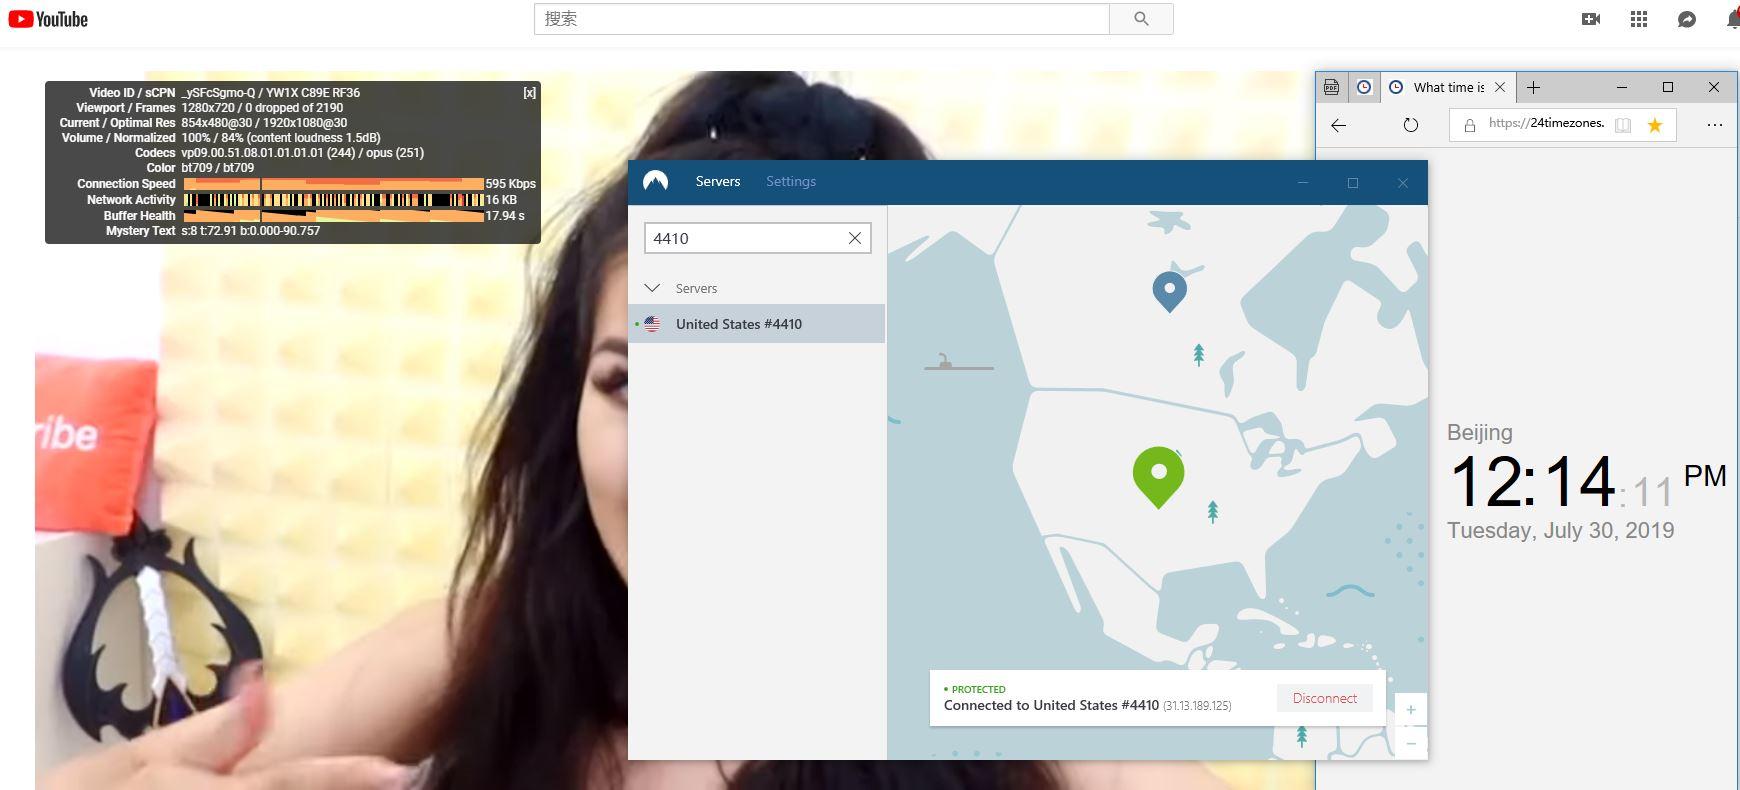 windows-nordvpn-udp协议-美国4410服务器-中国翻墙-科学上网-YouTube-20190730